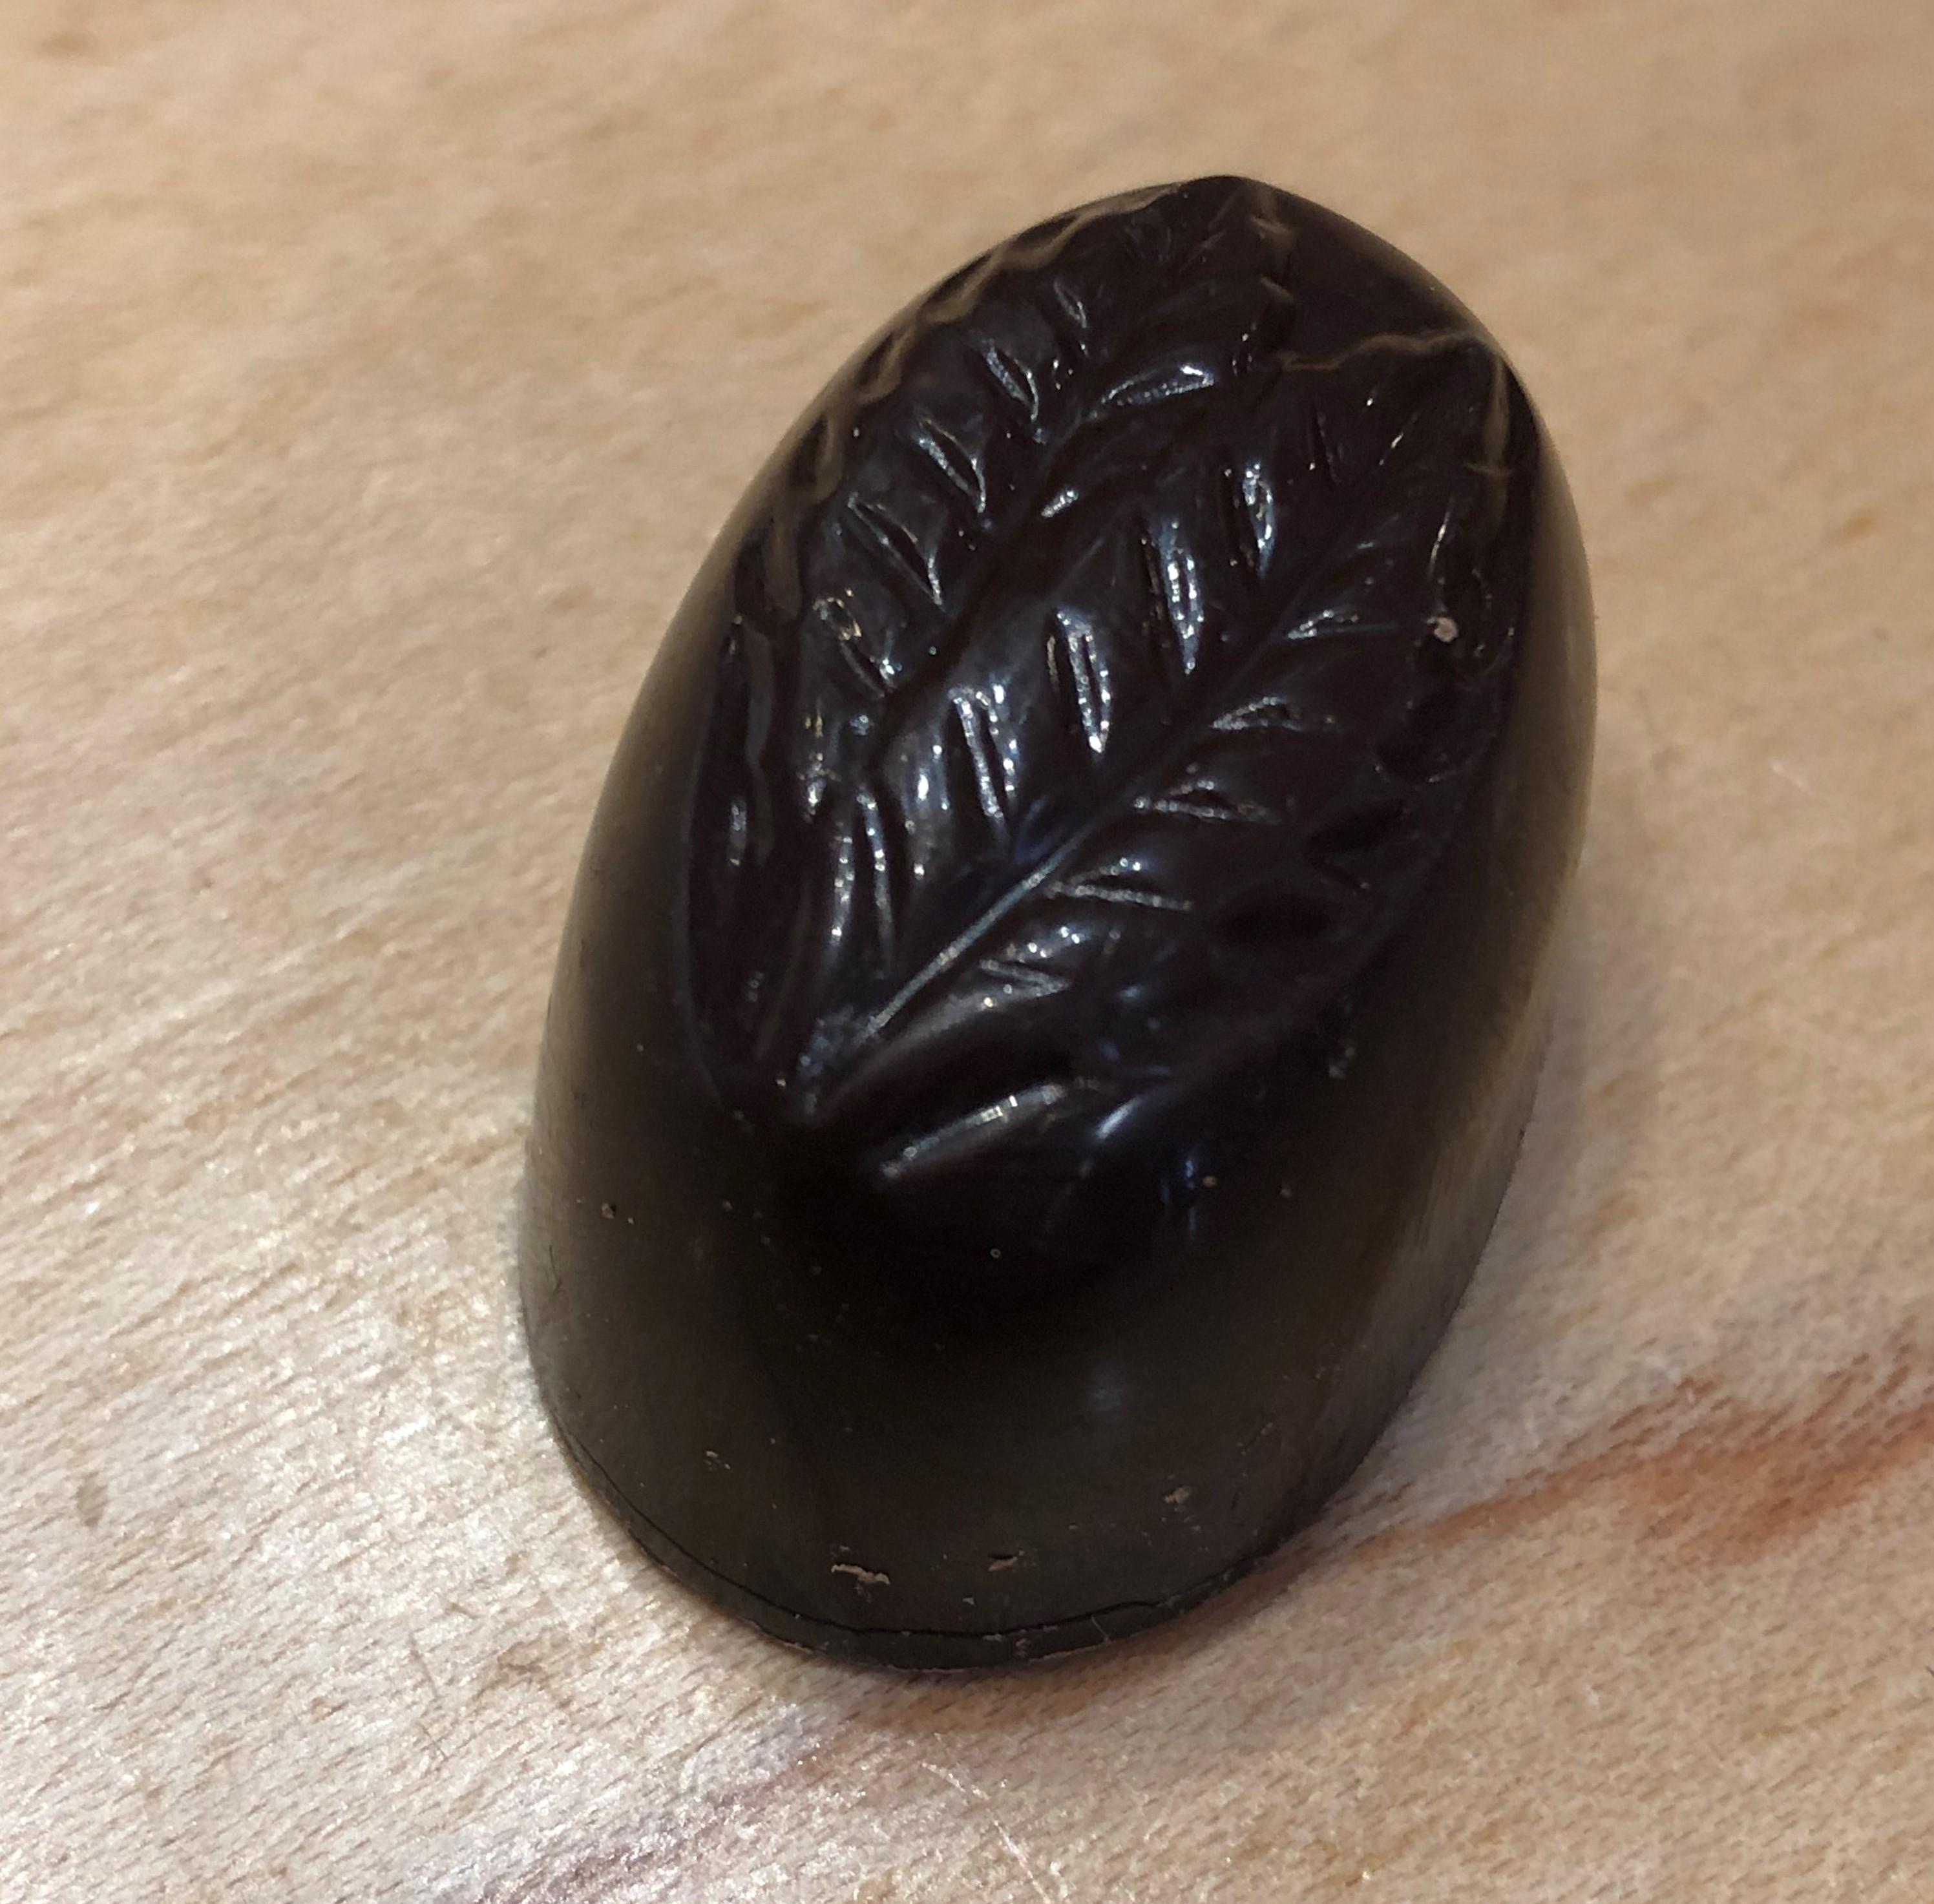 Dark Chocolate Coffee fondant